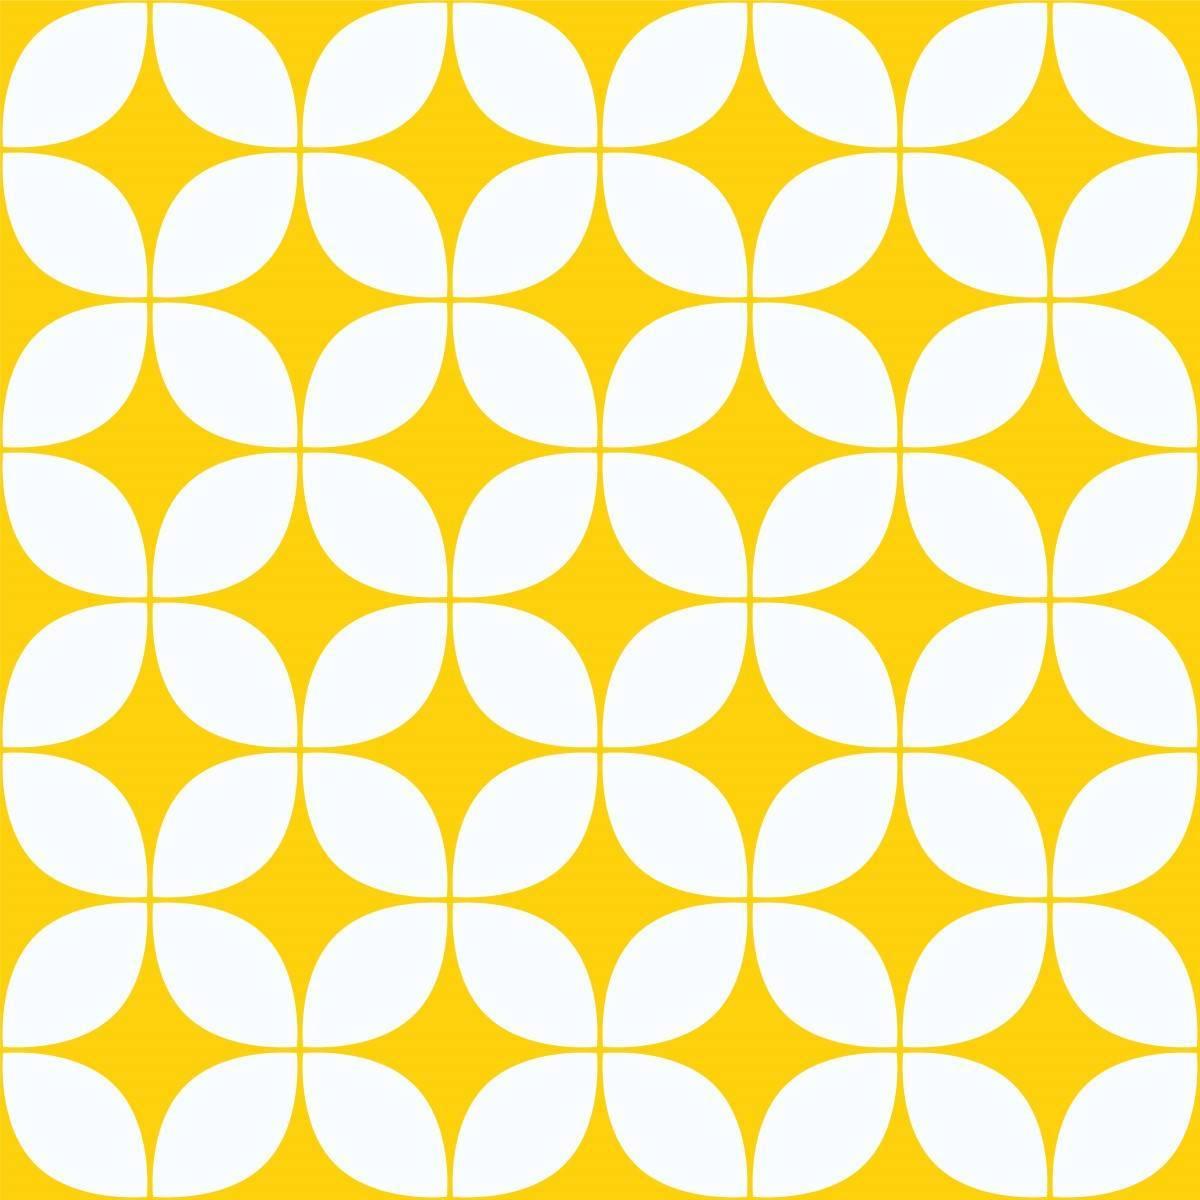 Papel de Parede Retrô Amarelo | Adesivo Vinilico imagem 2